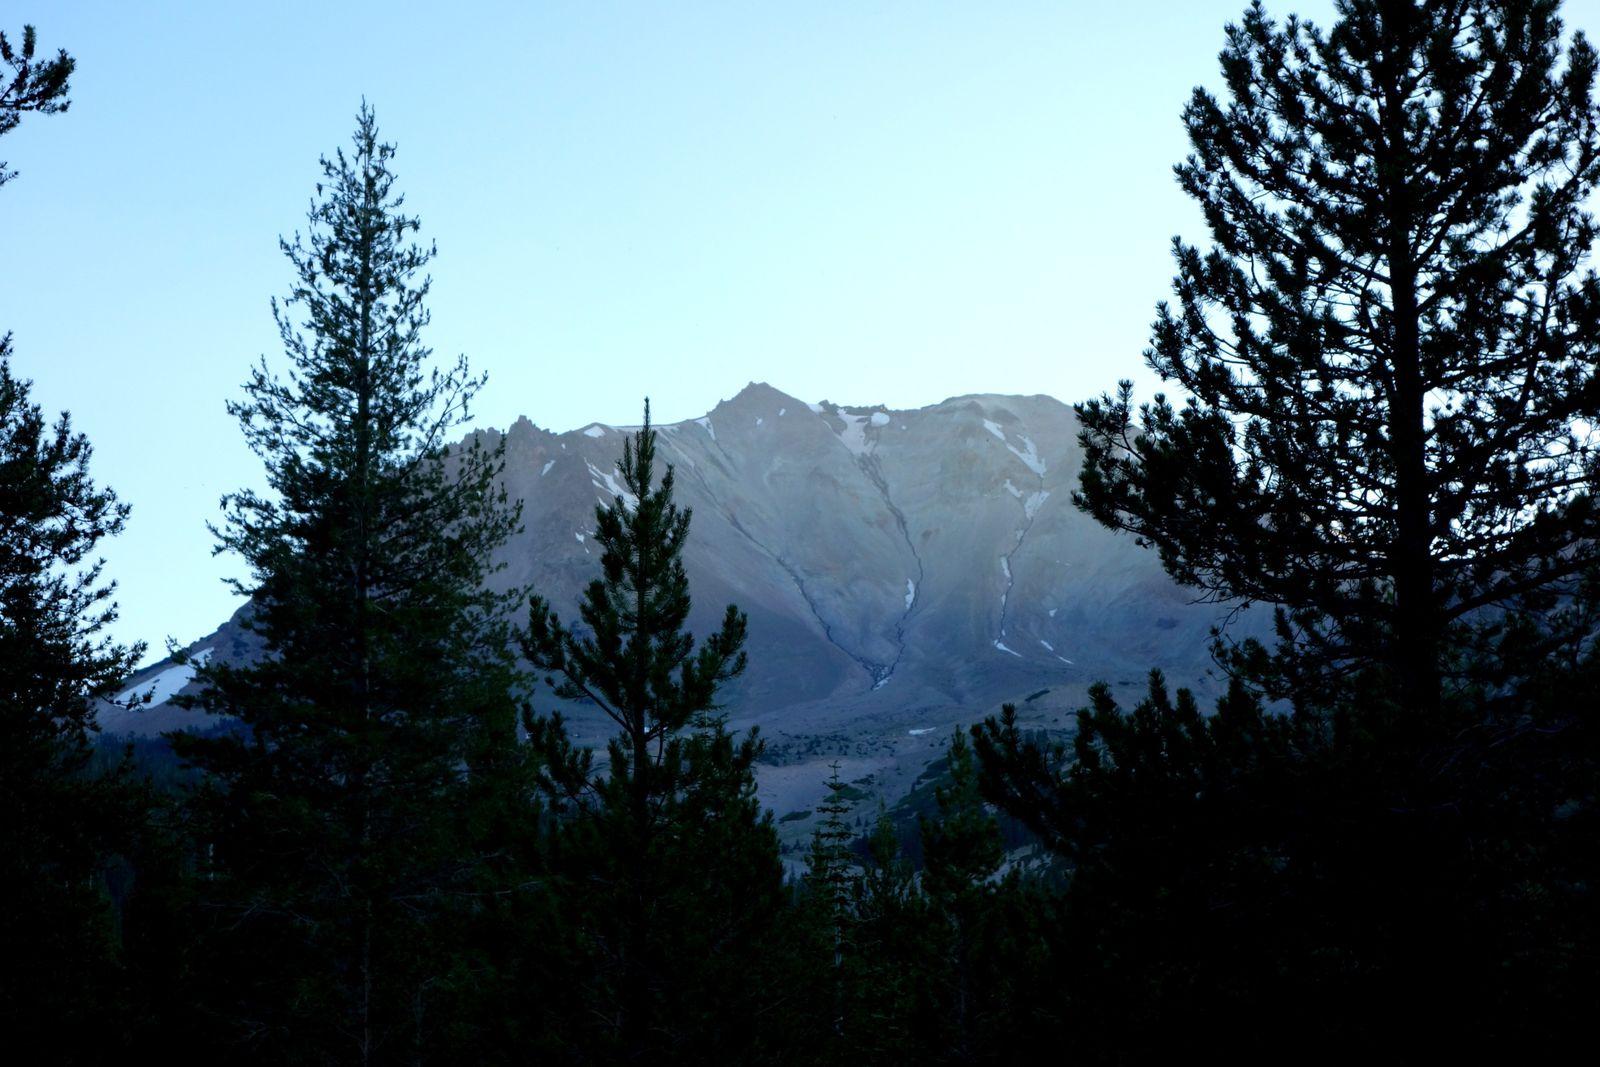 Photos: Lassen Volcanic National Park